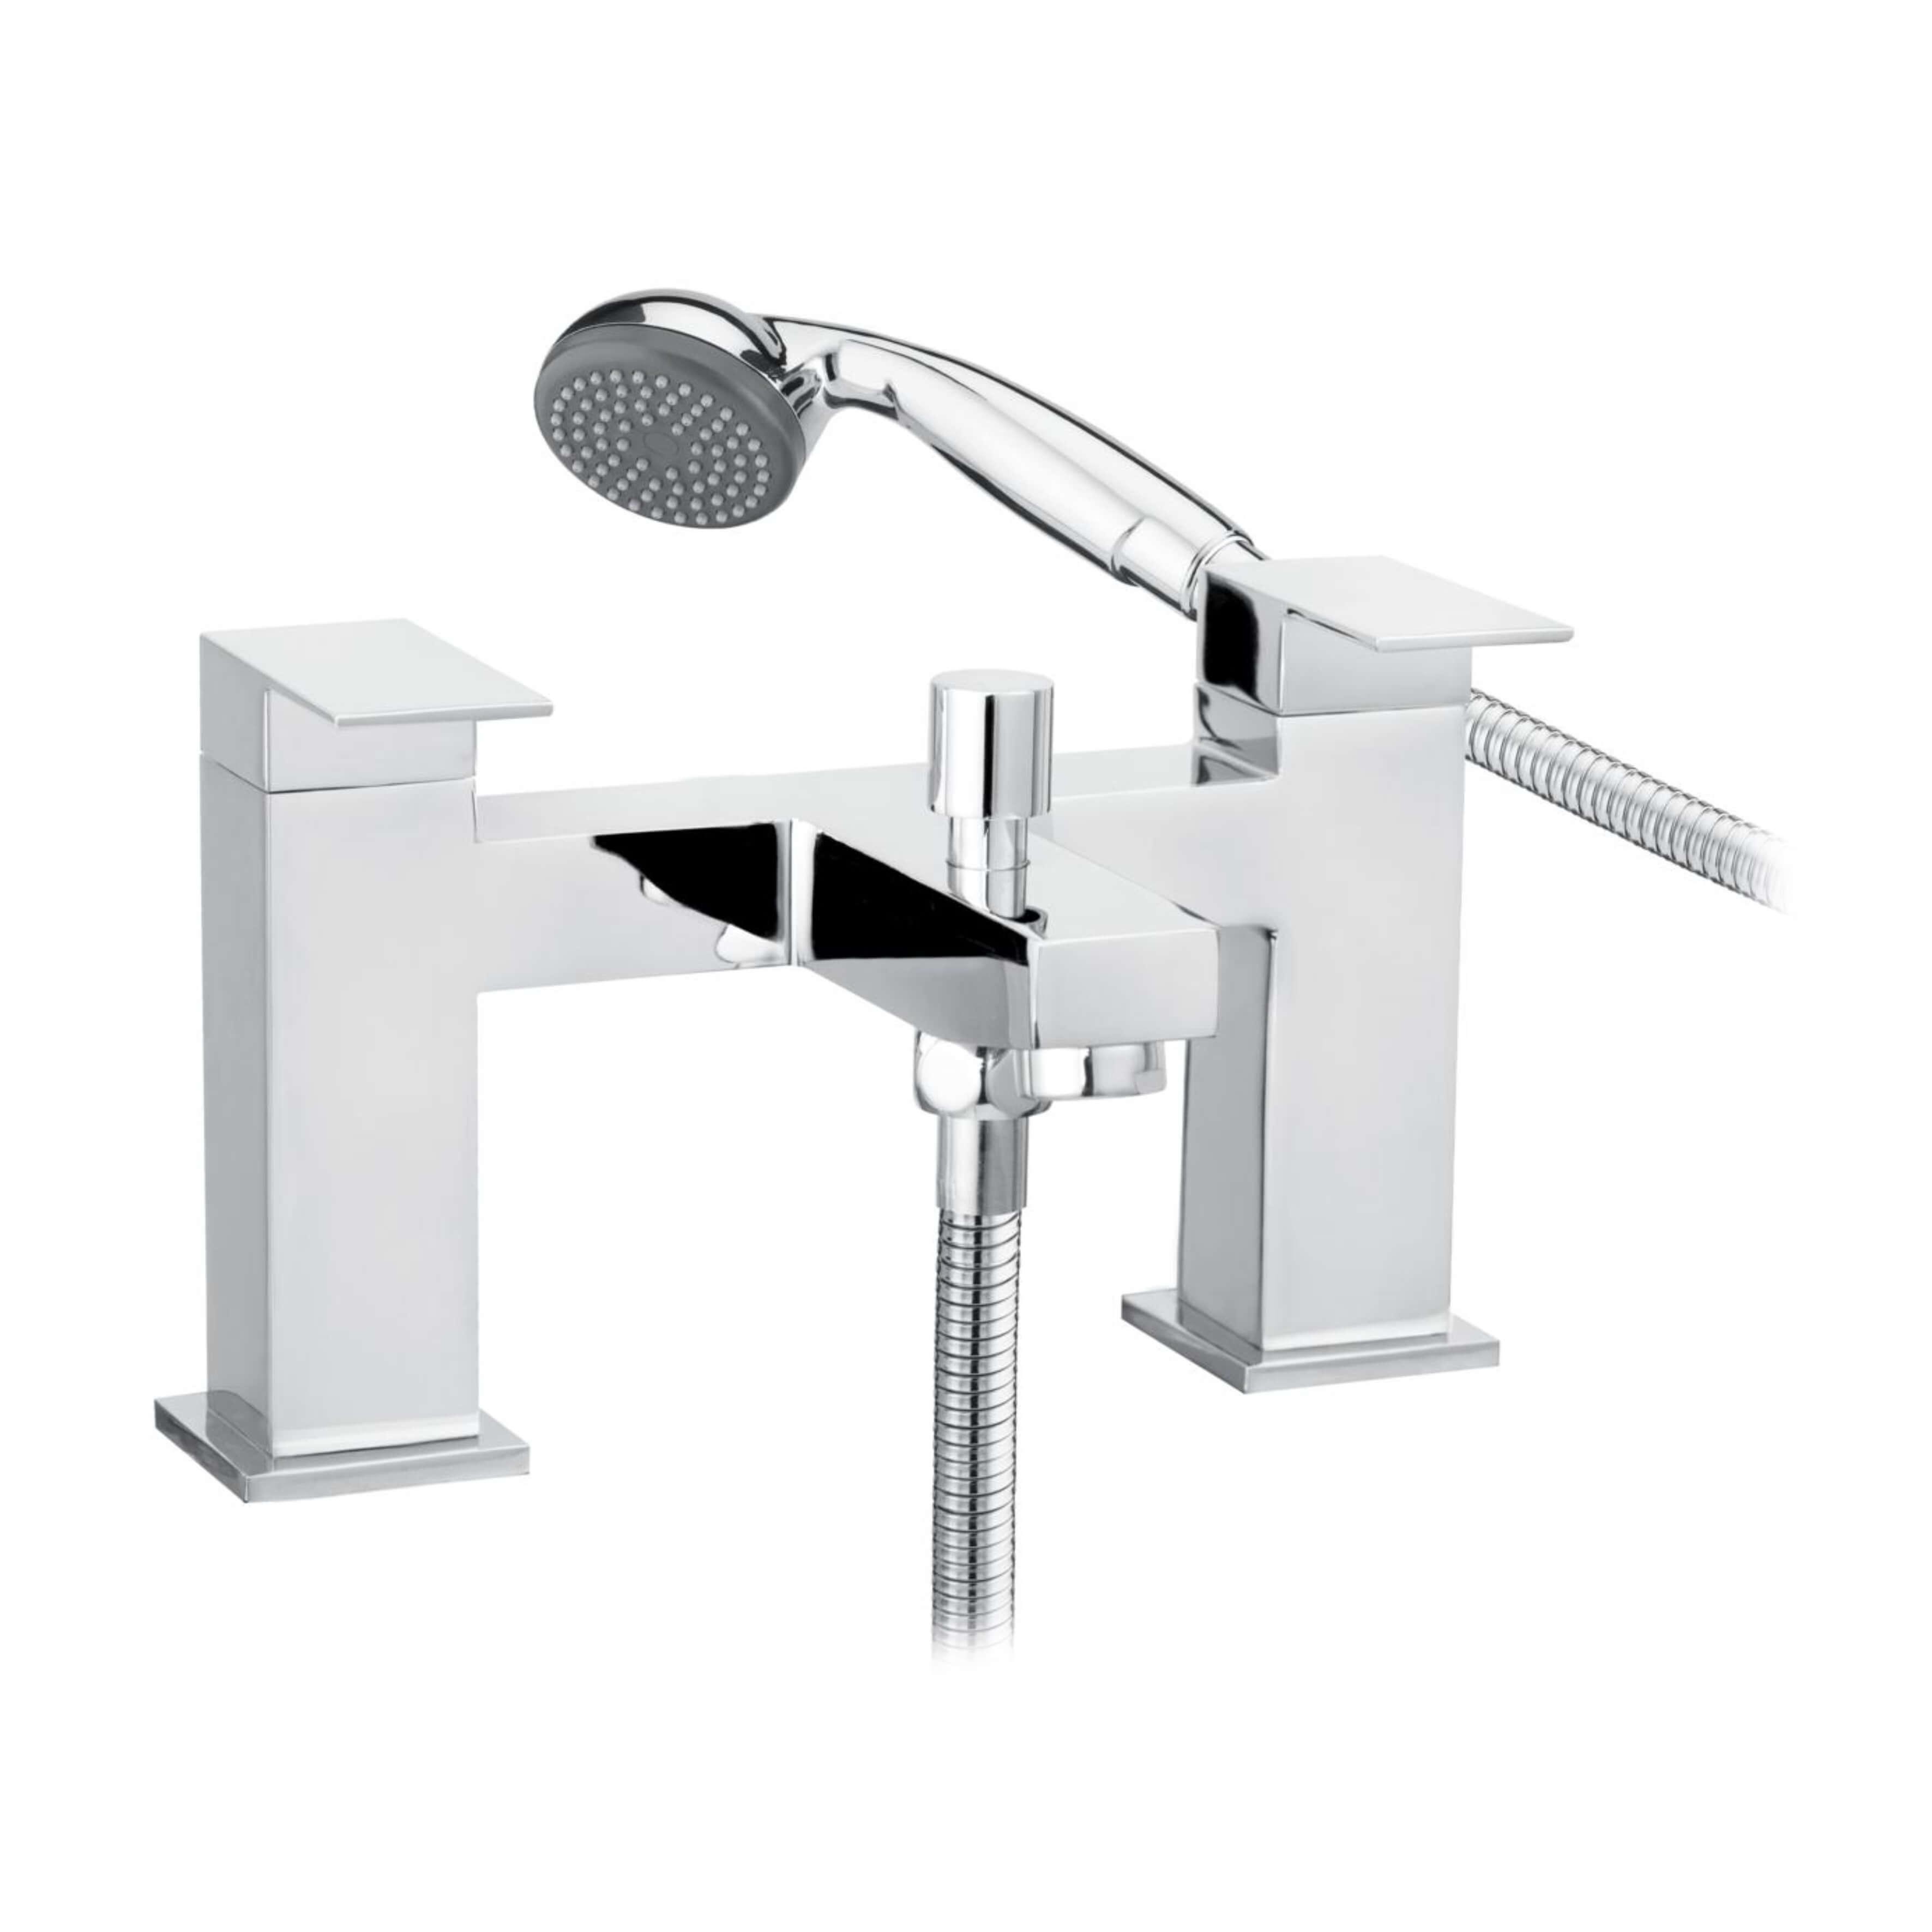 Cascade Edge Bath Shower Mixer 006.21913.3